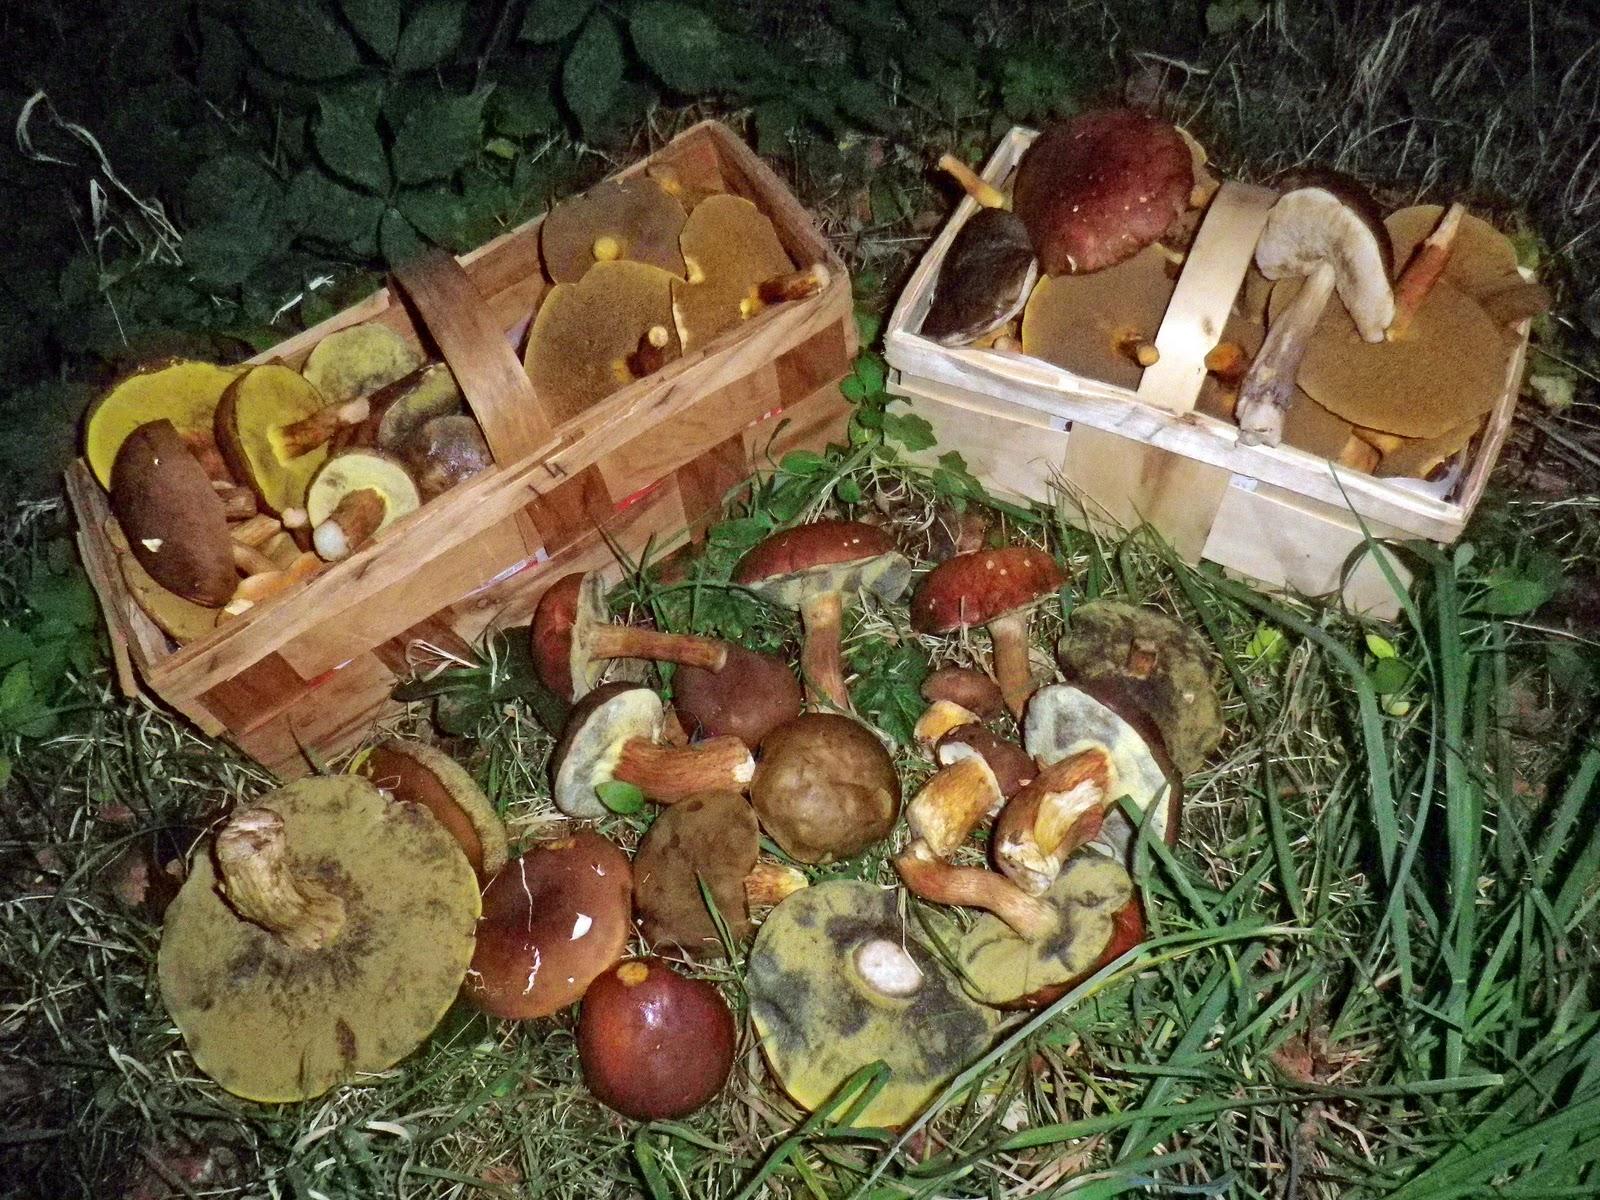 pilze sammeln und pilze bestimmen blog pilze sammeln in hamburg. Black Bedroom Furniture Sets. Home Design Ideas